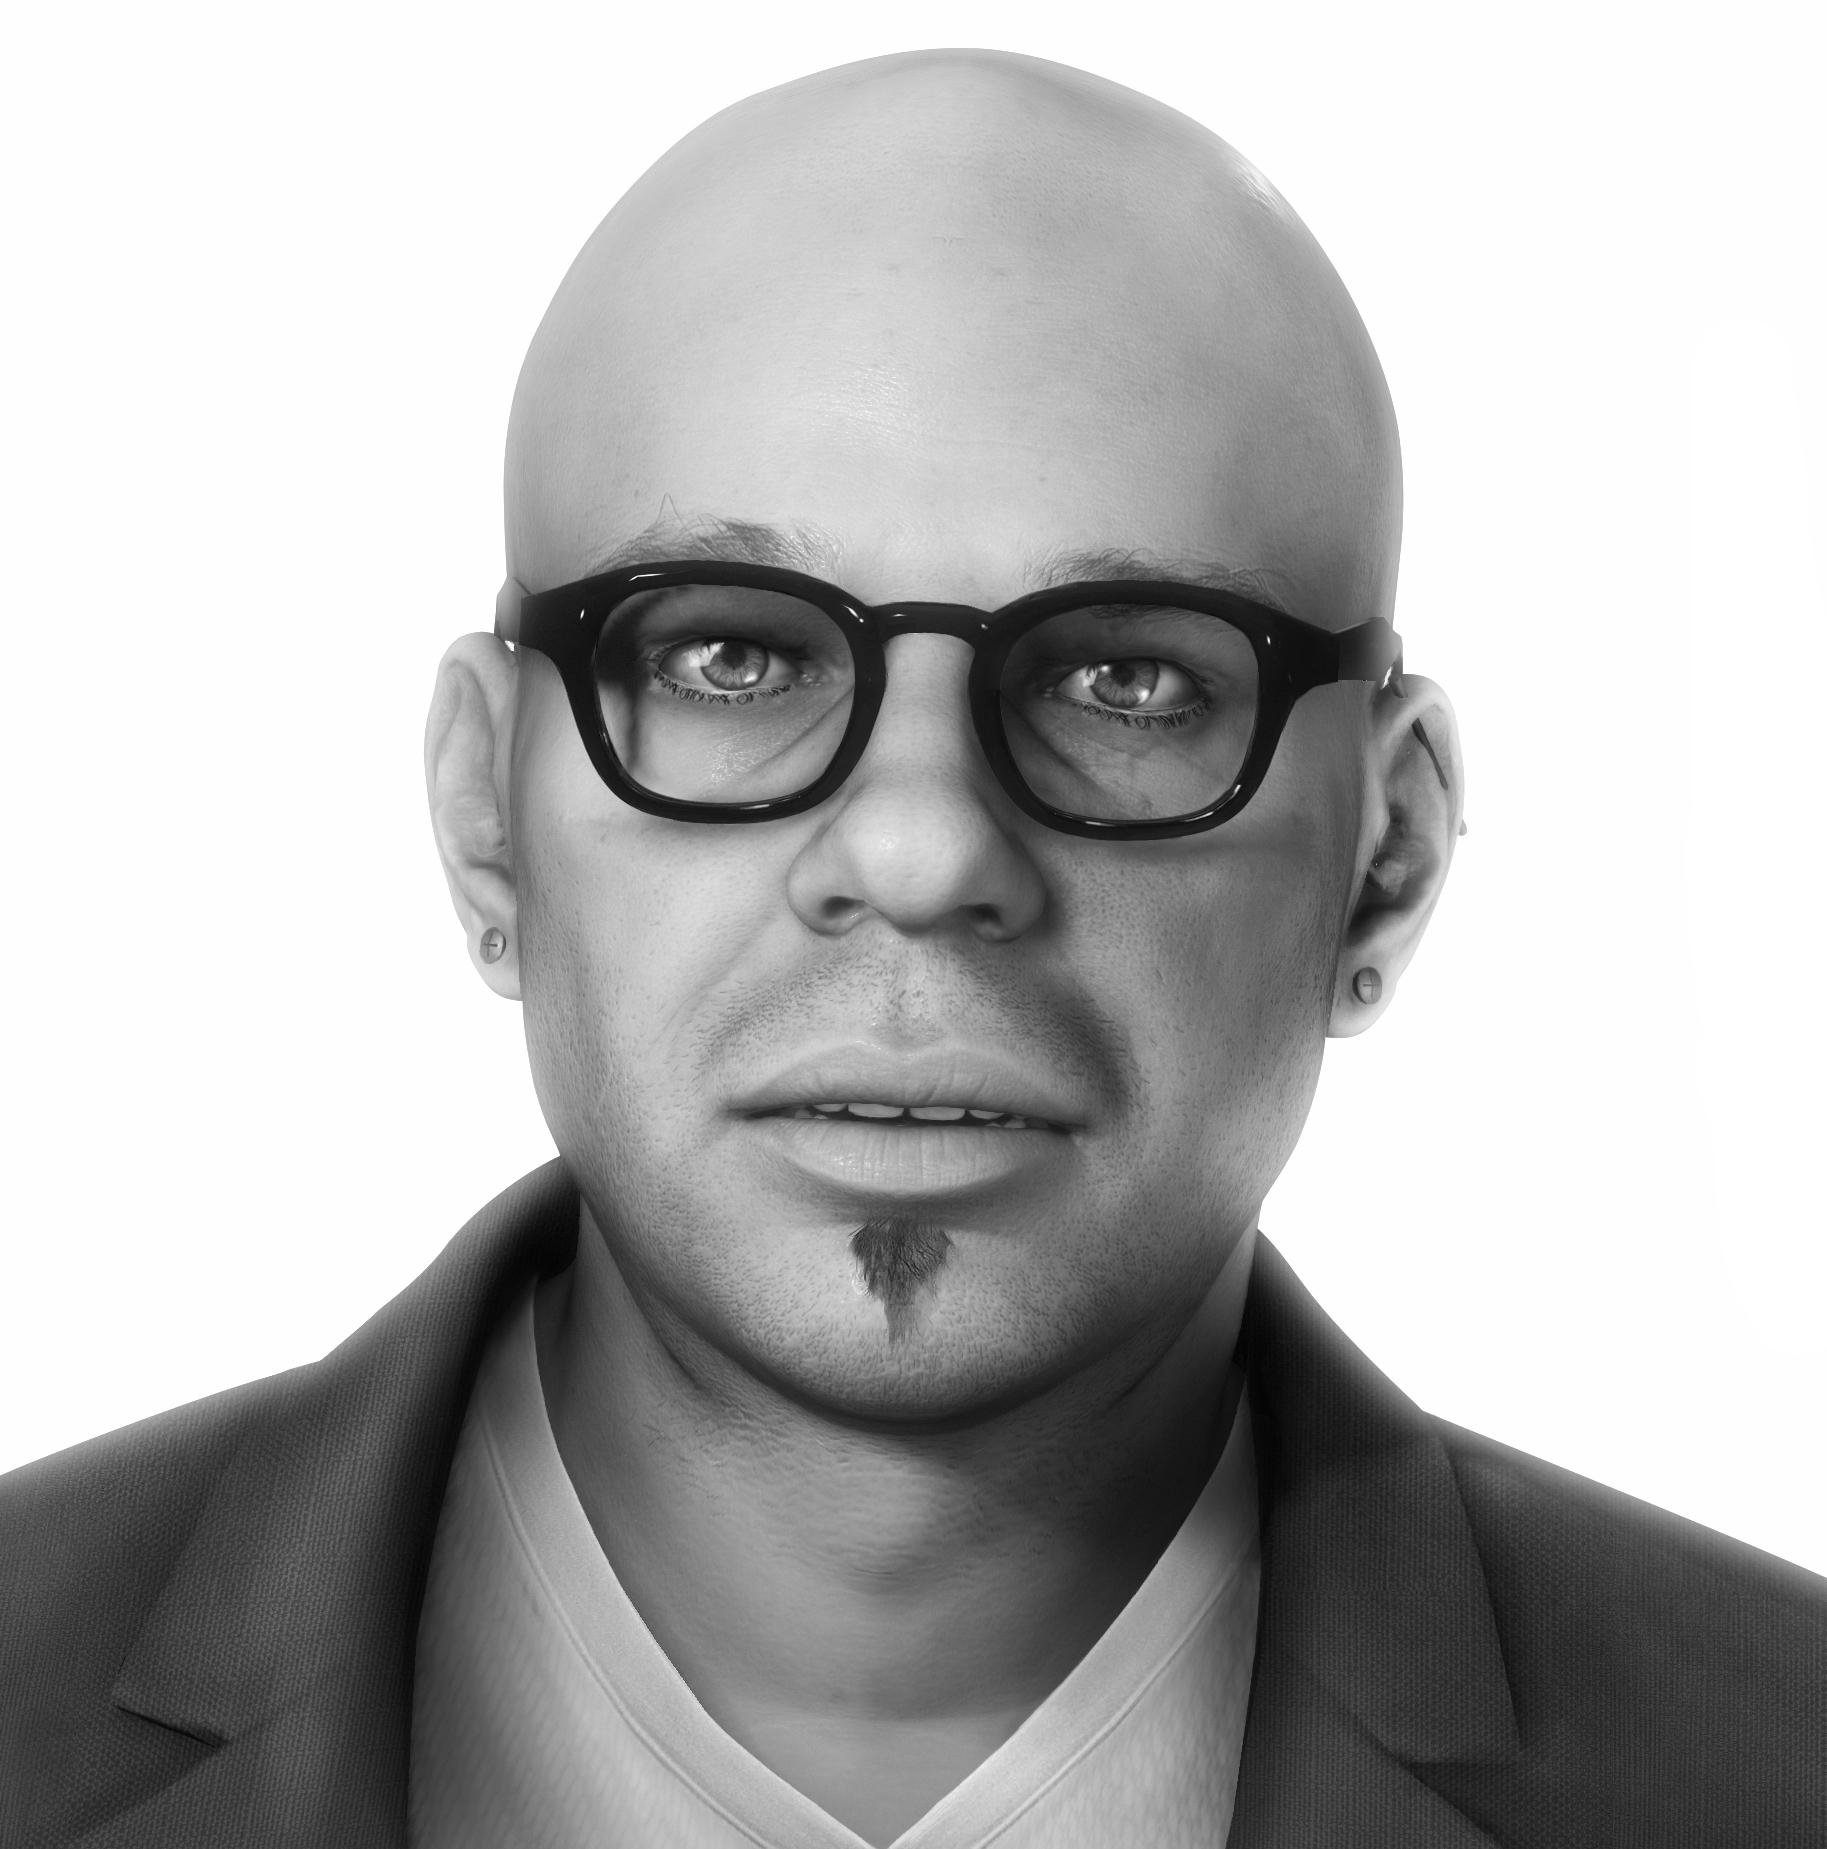 Joseph DeMarco